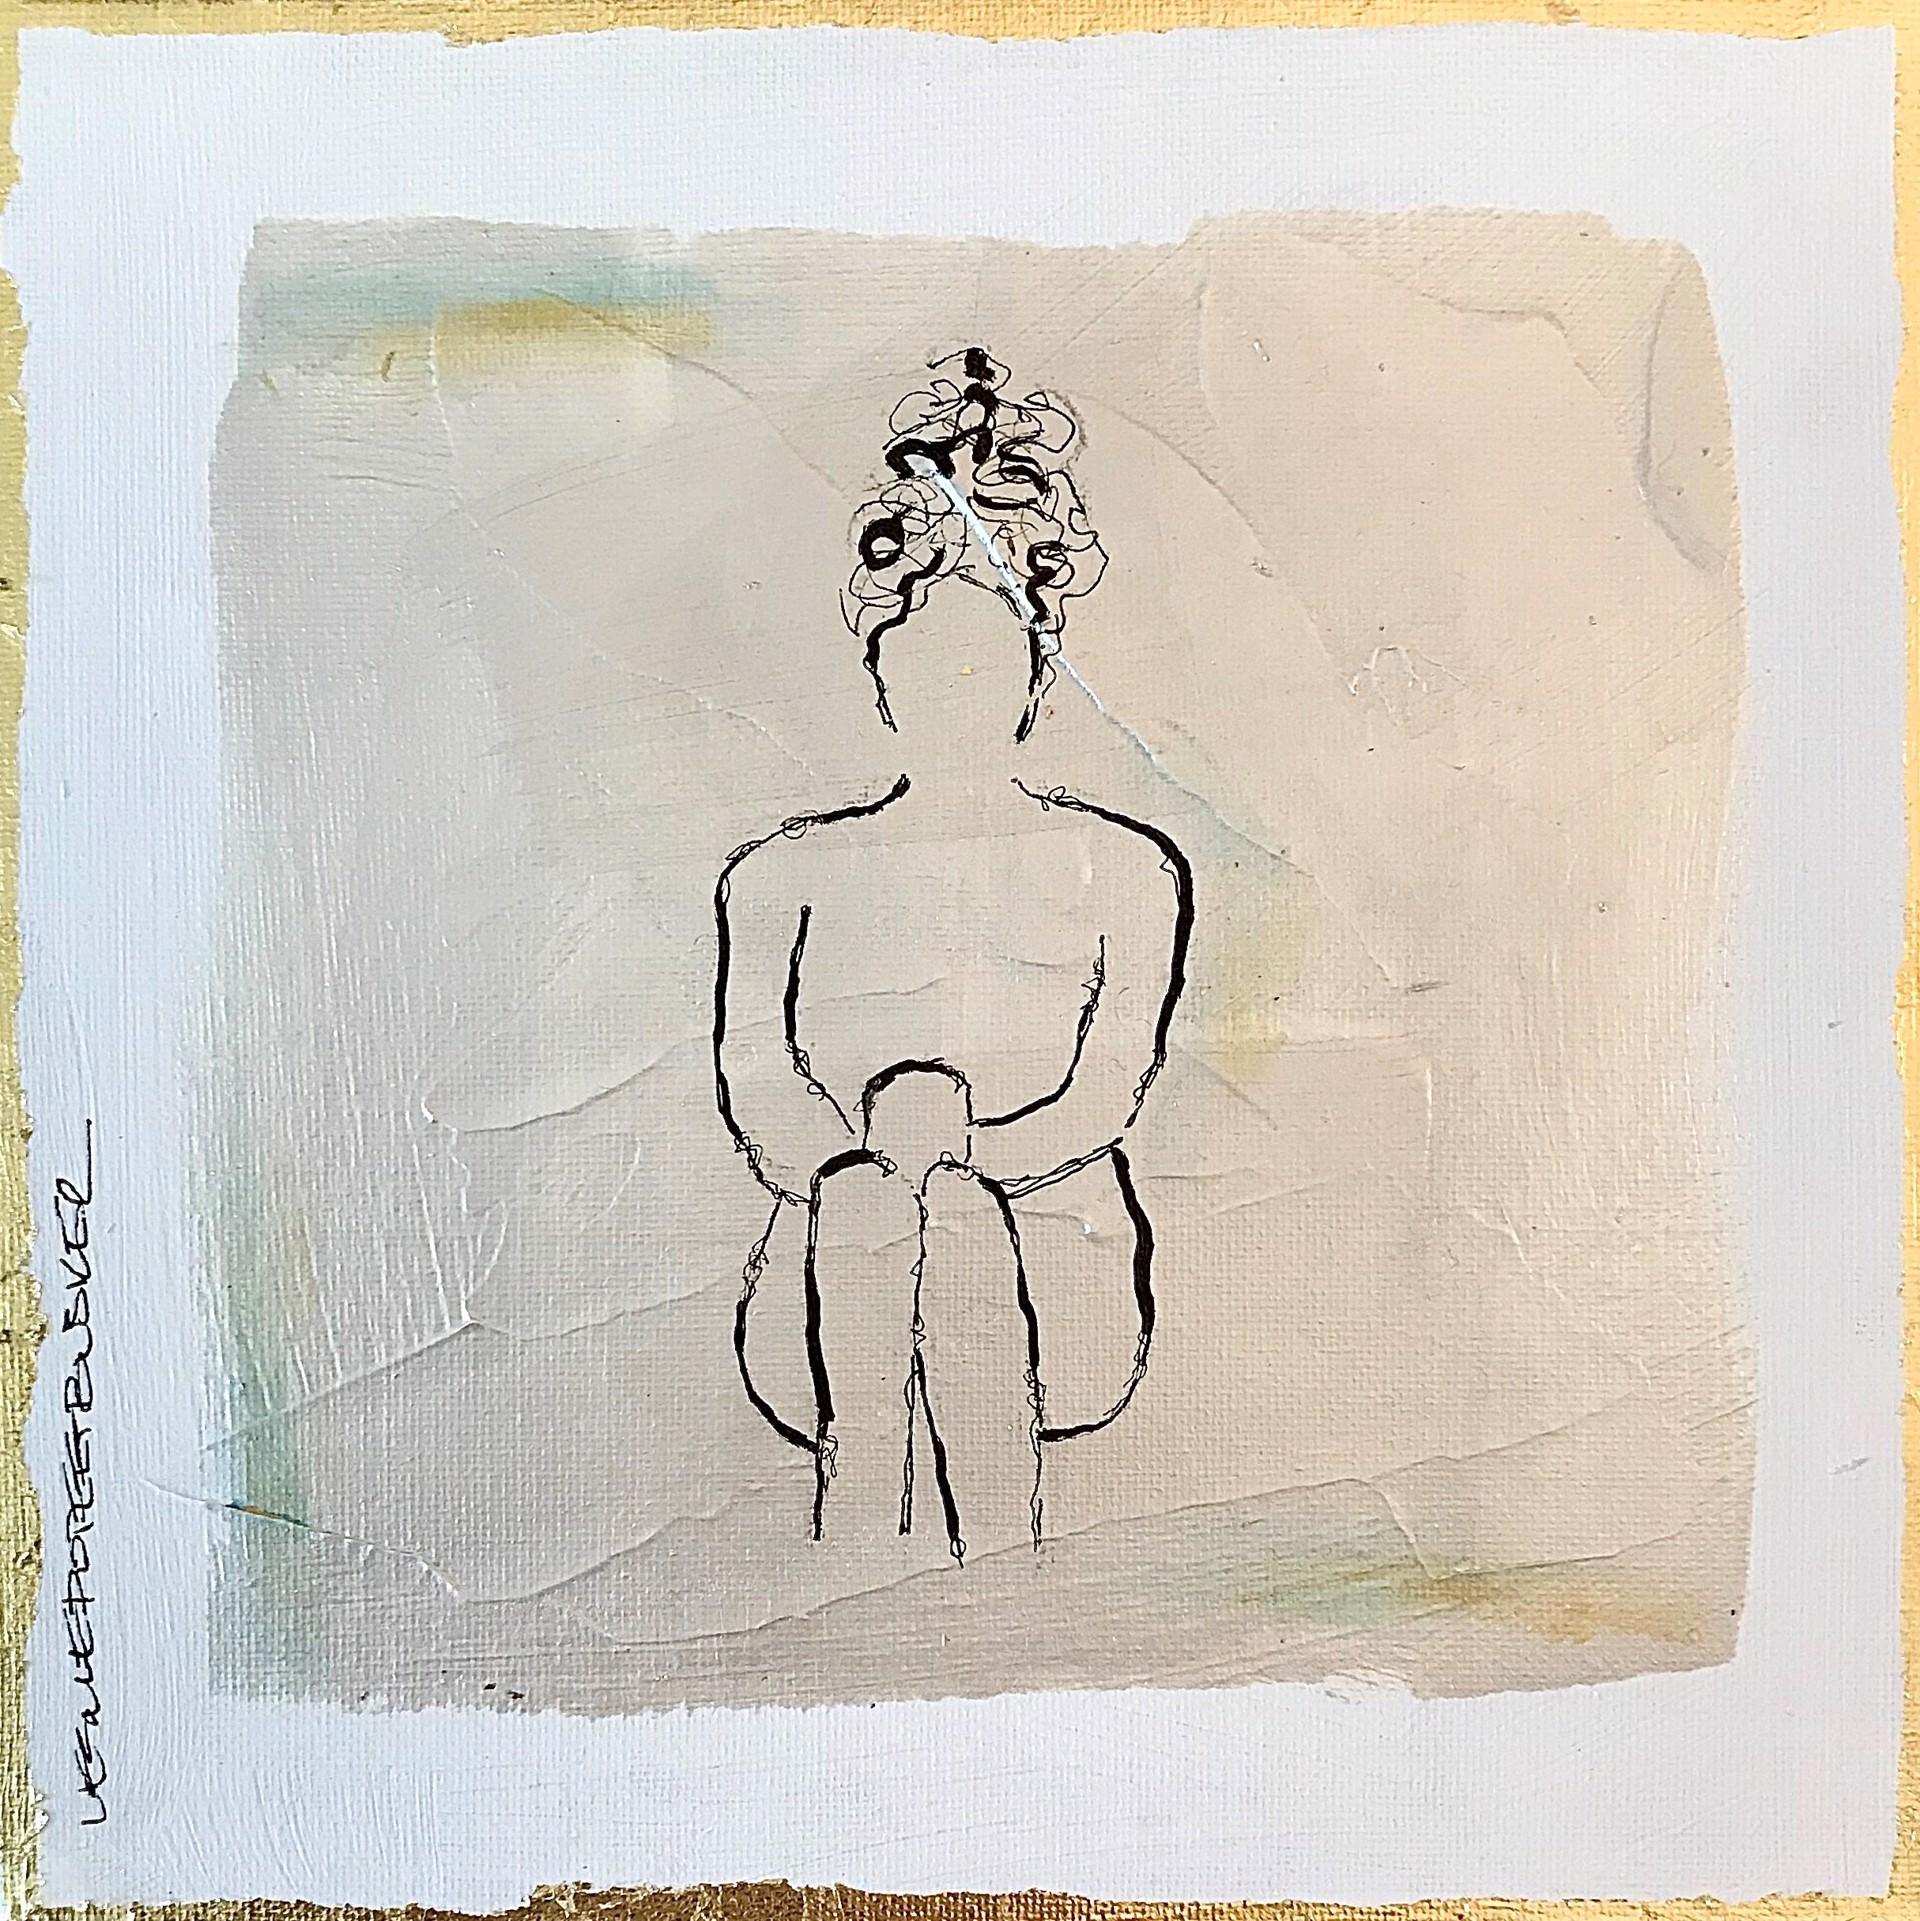 Figure No. 203 by Leslie Poteet Busker